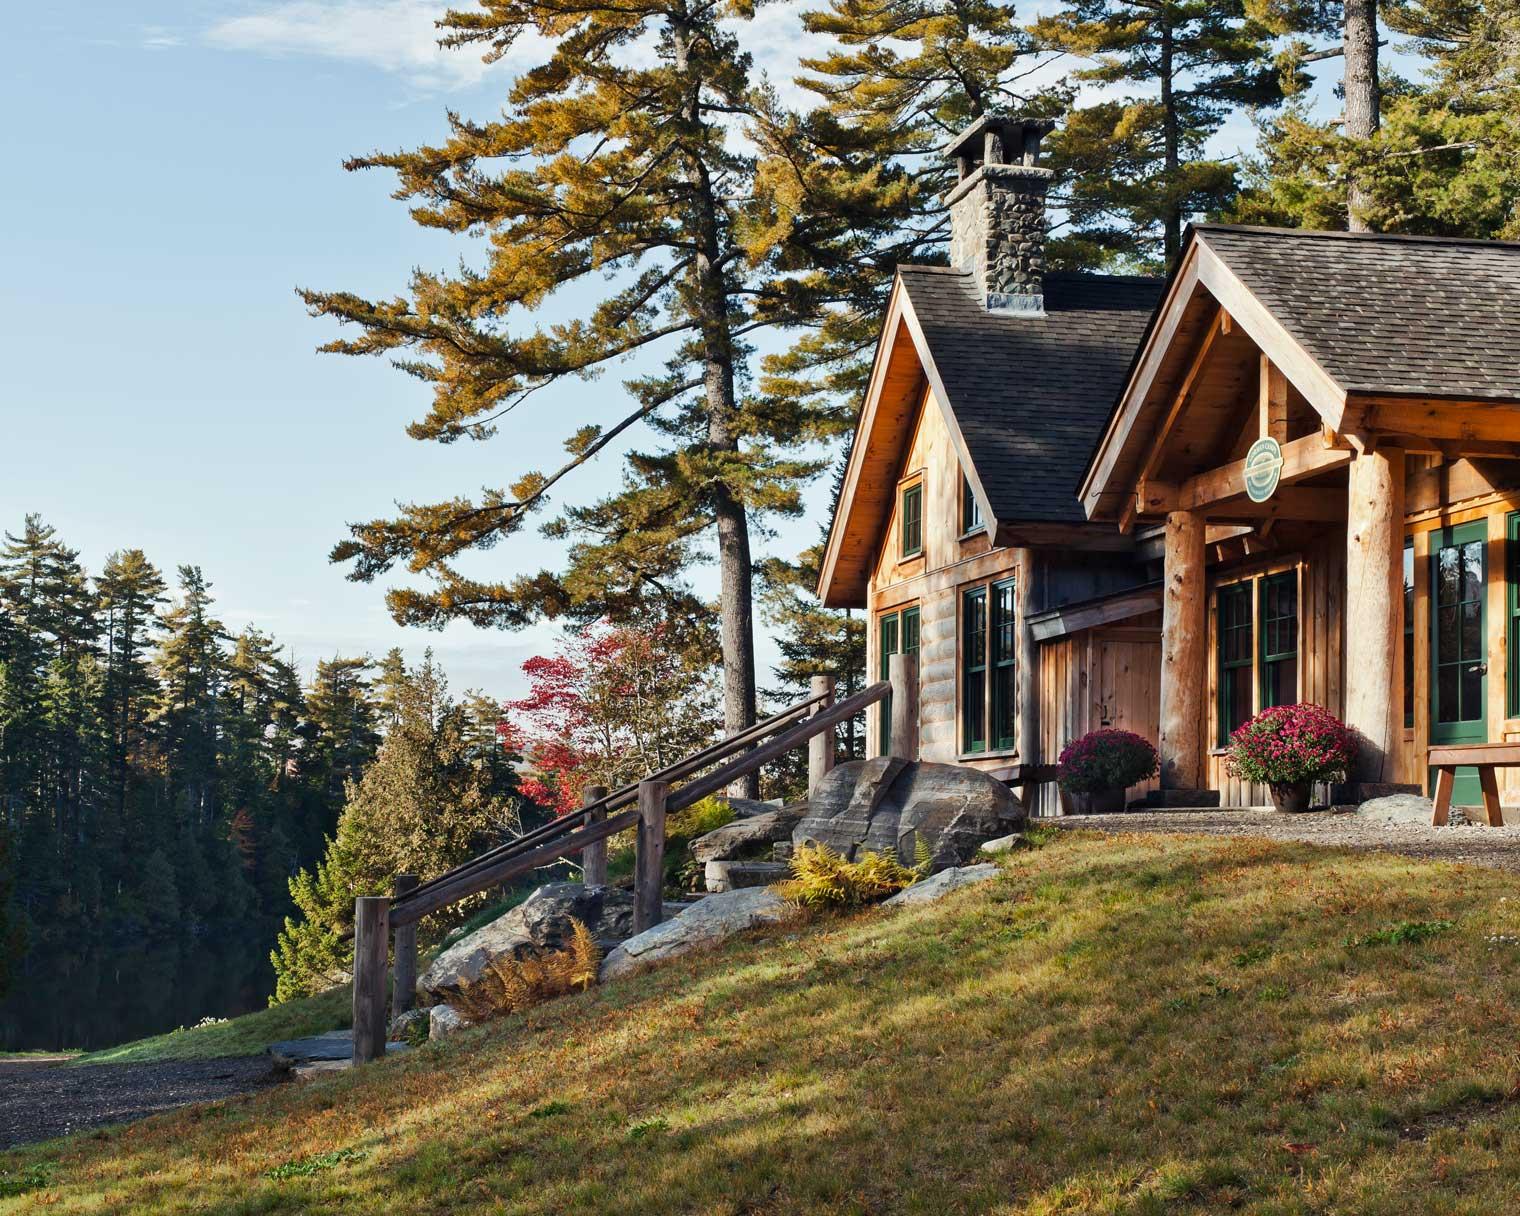 Gorman Chairback Lodge & Cabins